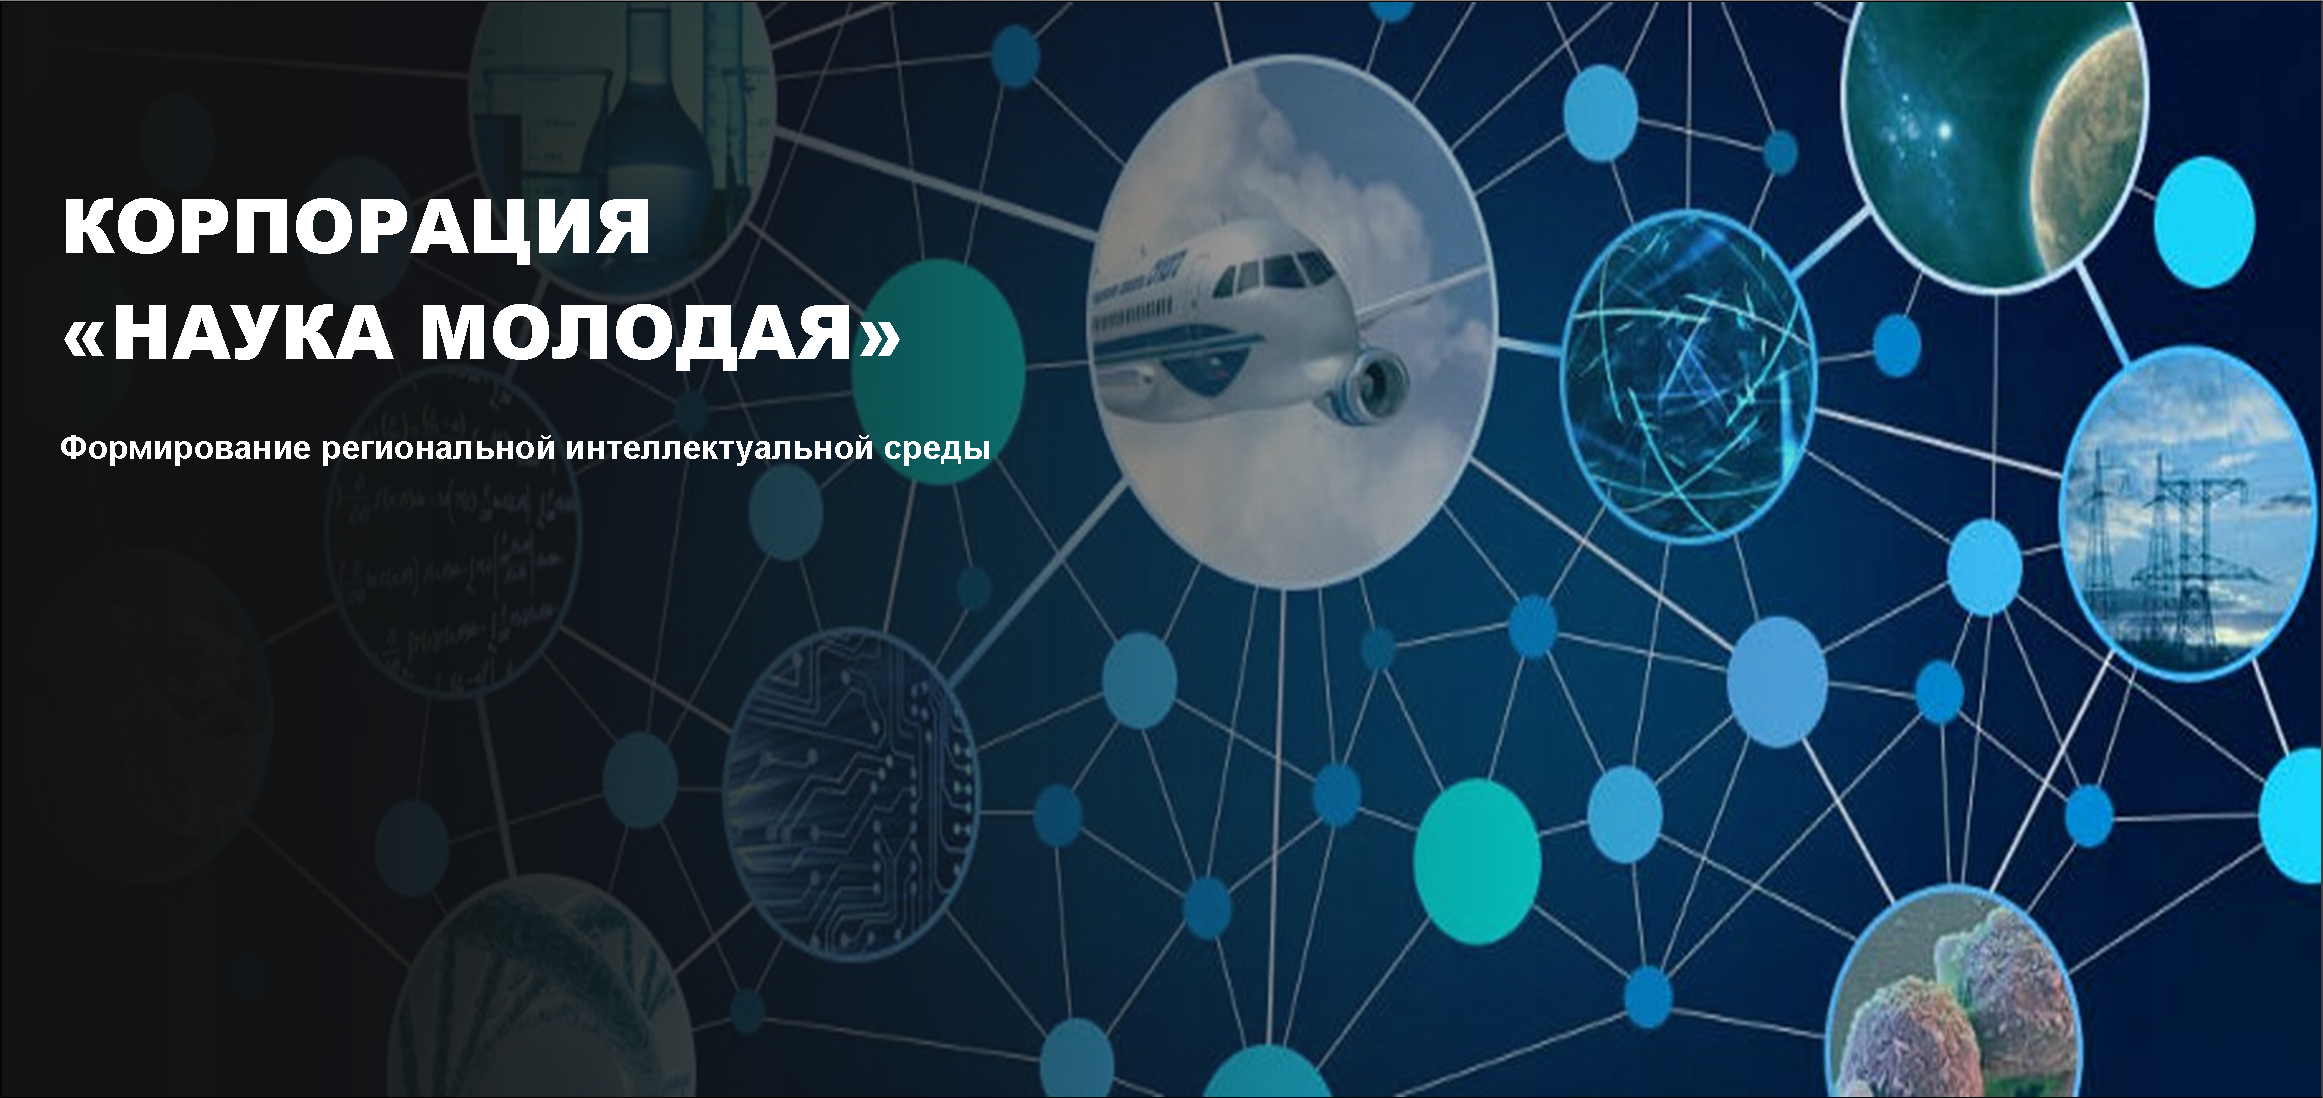 "Корпорация ""Наука молодая"""